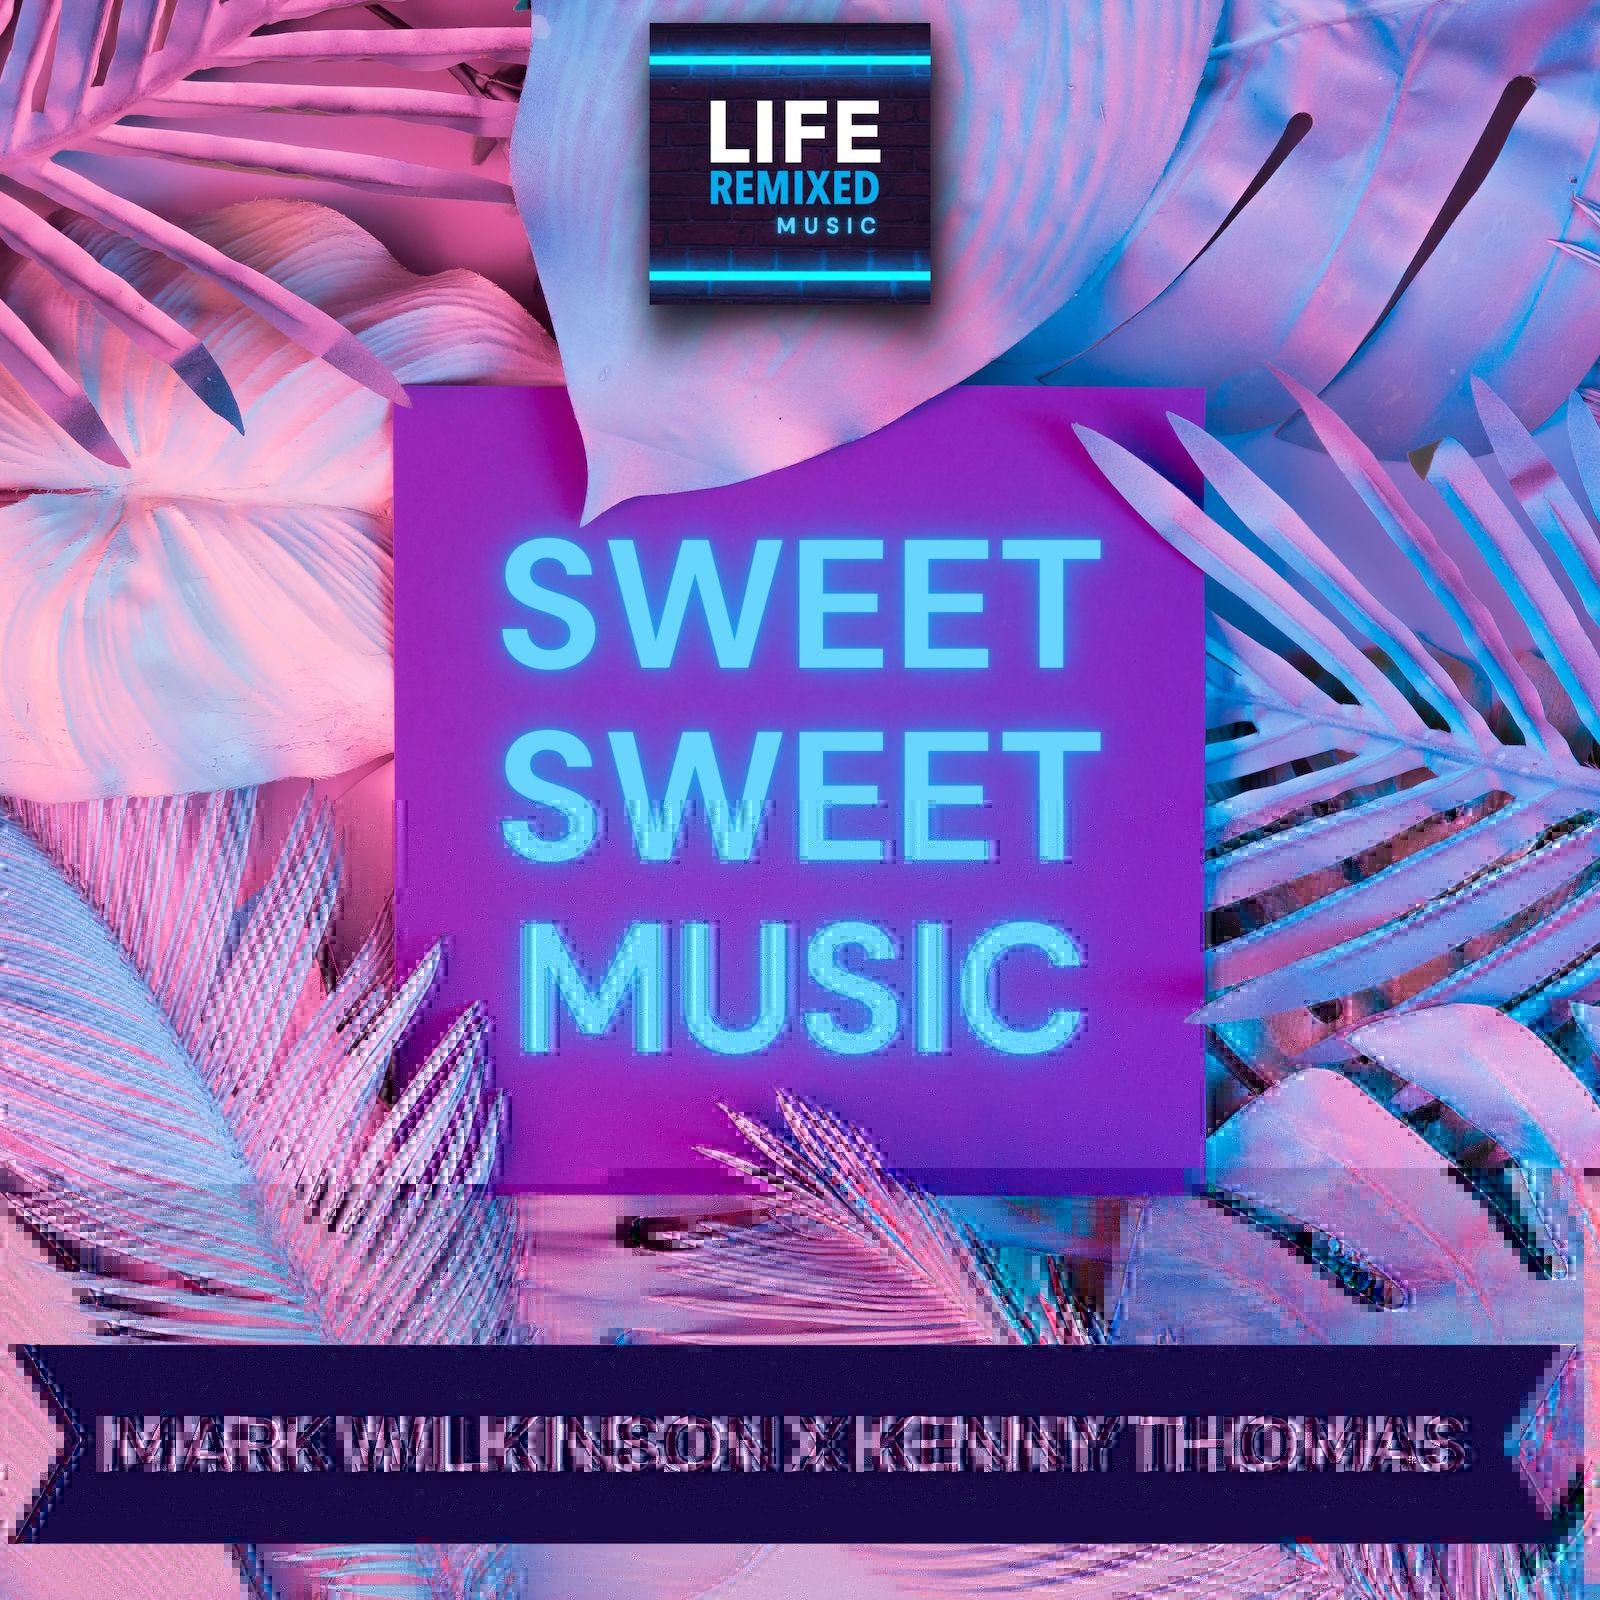 Mark Wilkinson & Kenny Thomas - Sweet Sweet Music [Life Remixed Music]